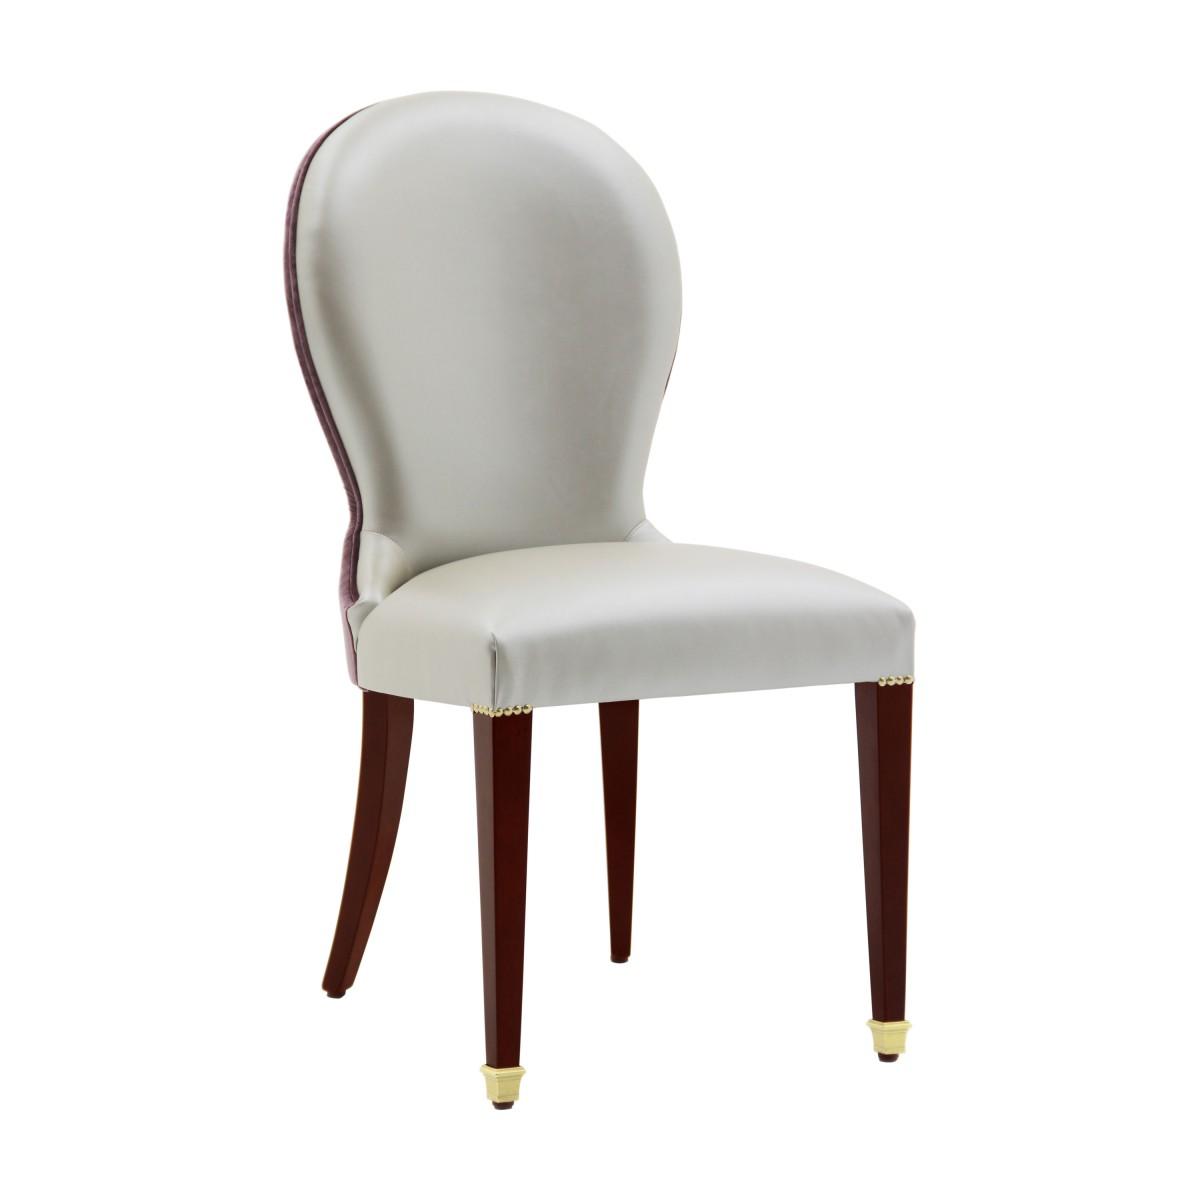 replica chair calipso 0 7978